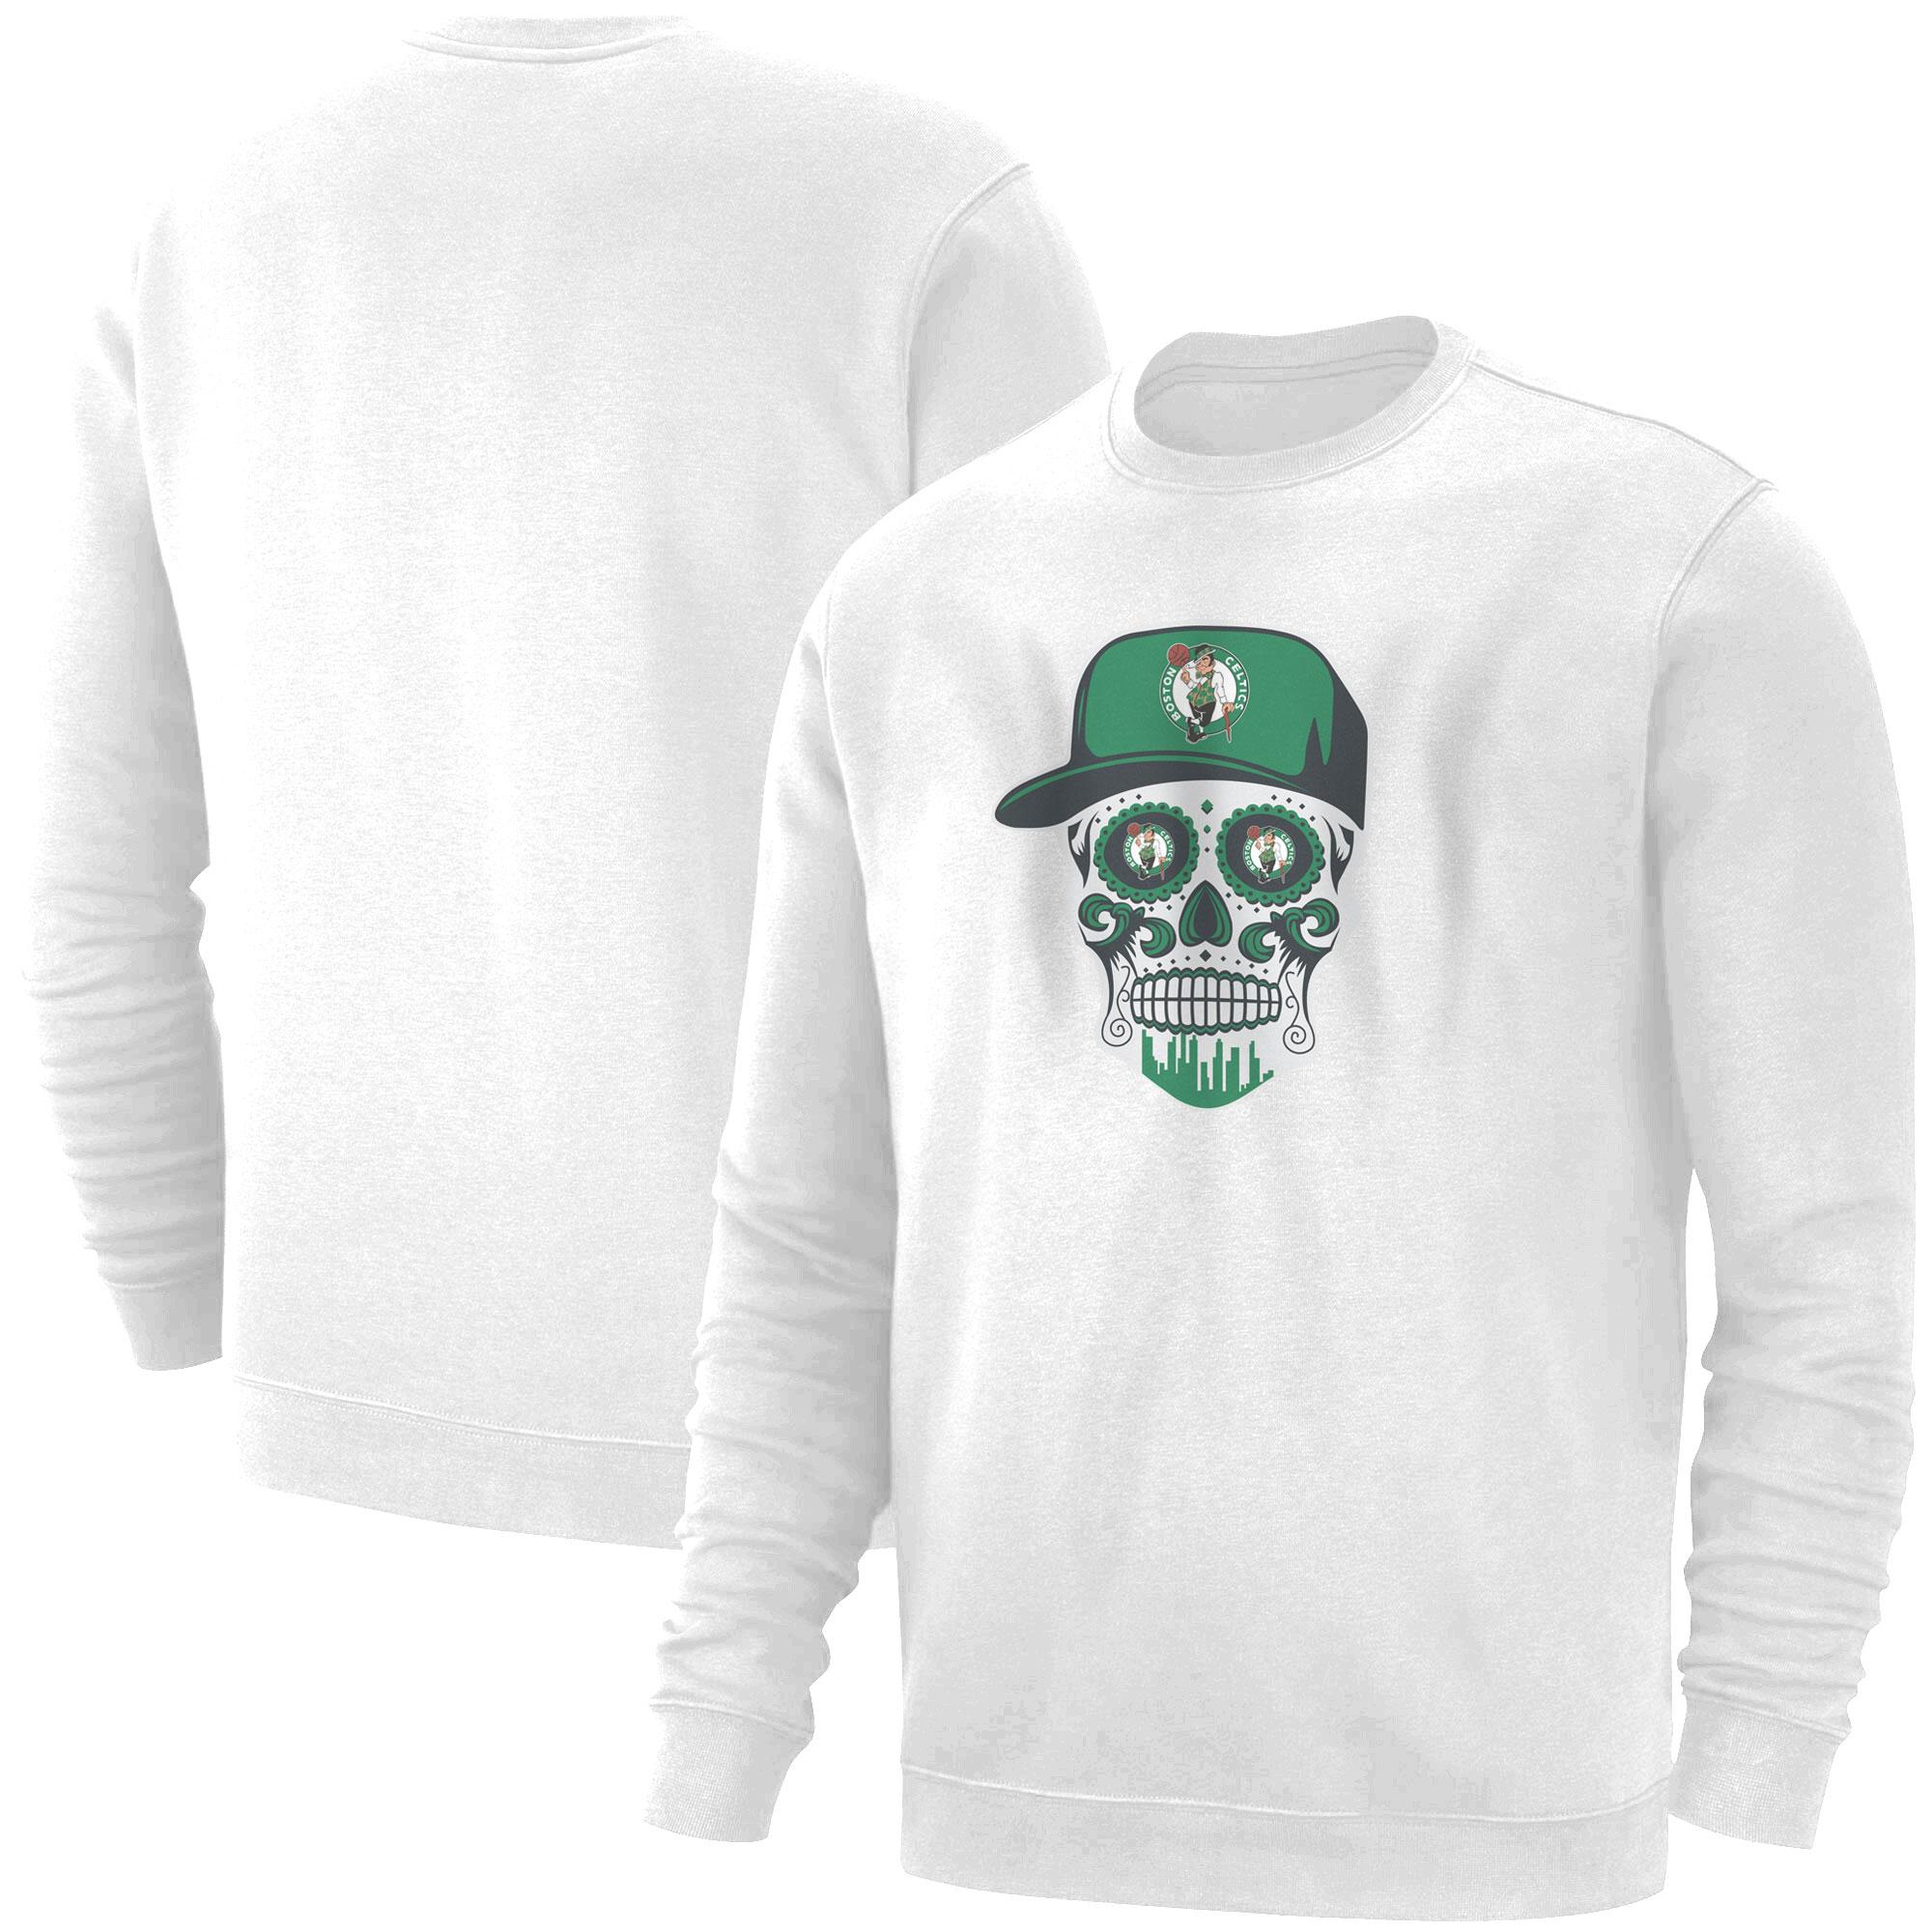 Celtics Skull  Basic (BSC-WHT-NP-448-NBA-BSTN-SKULL)